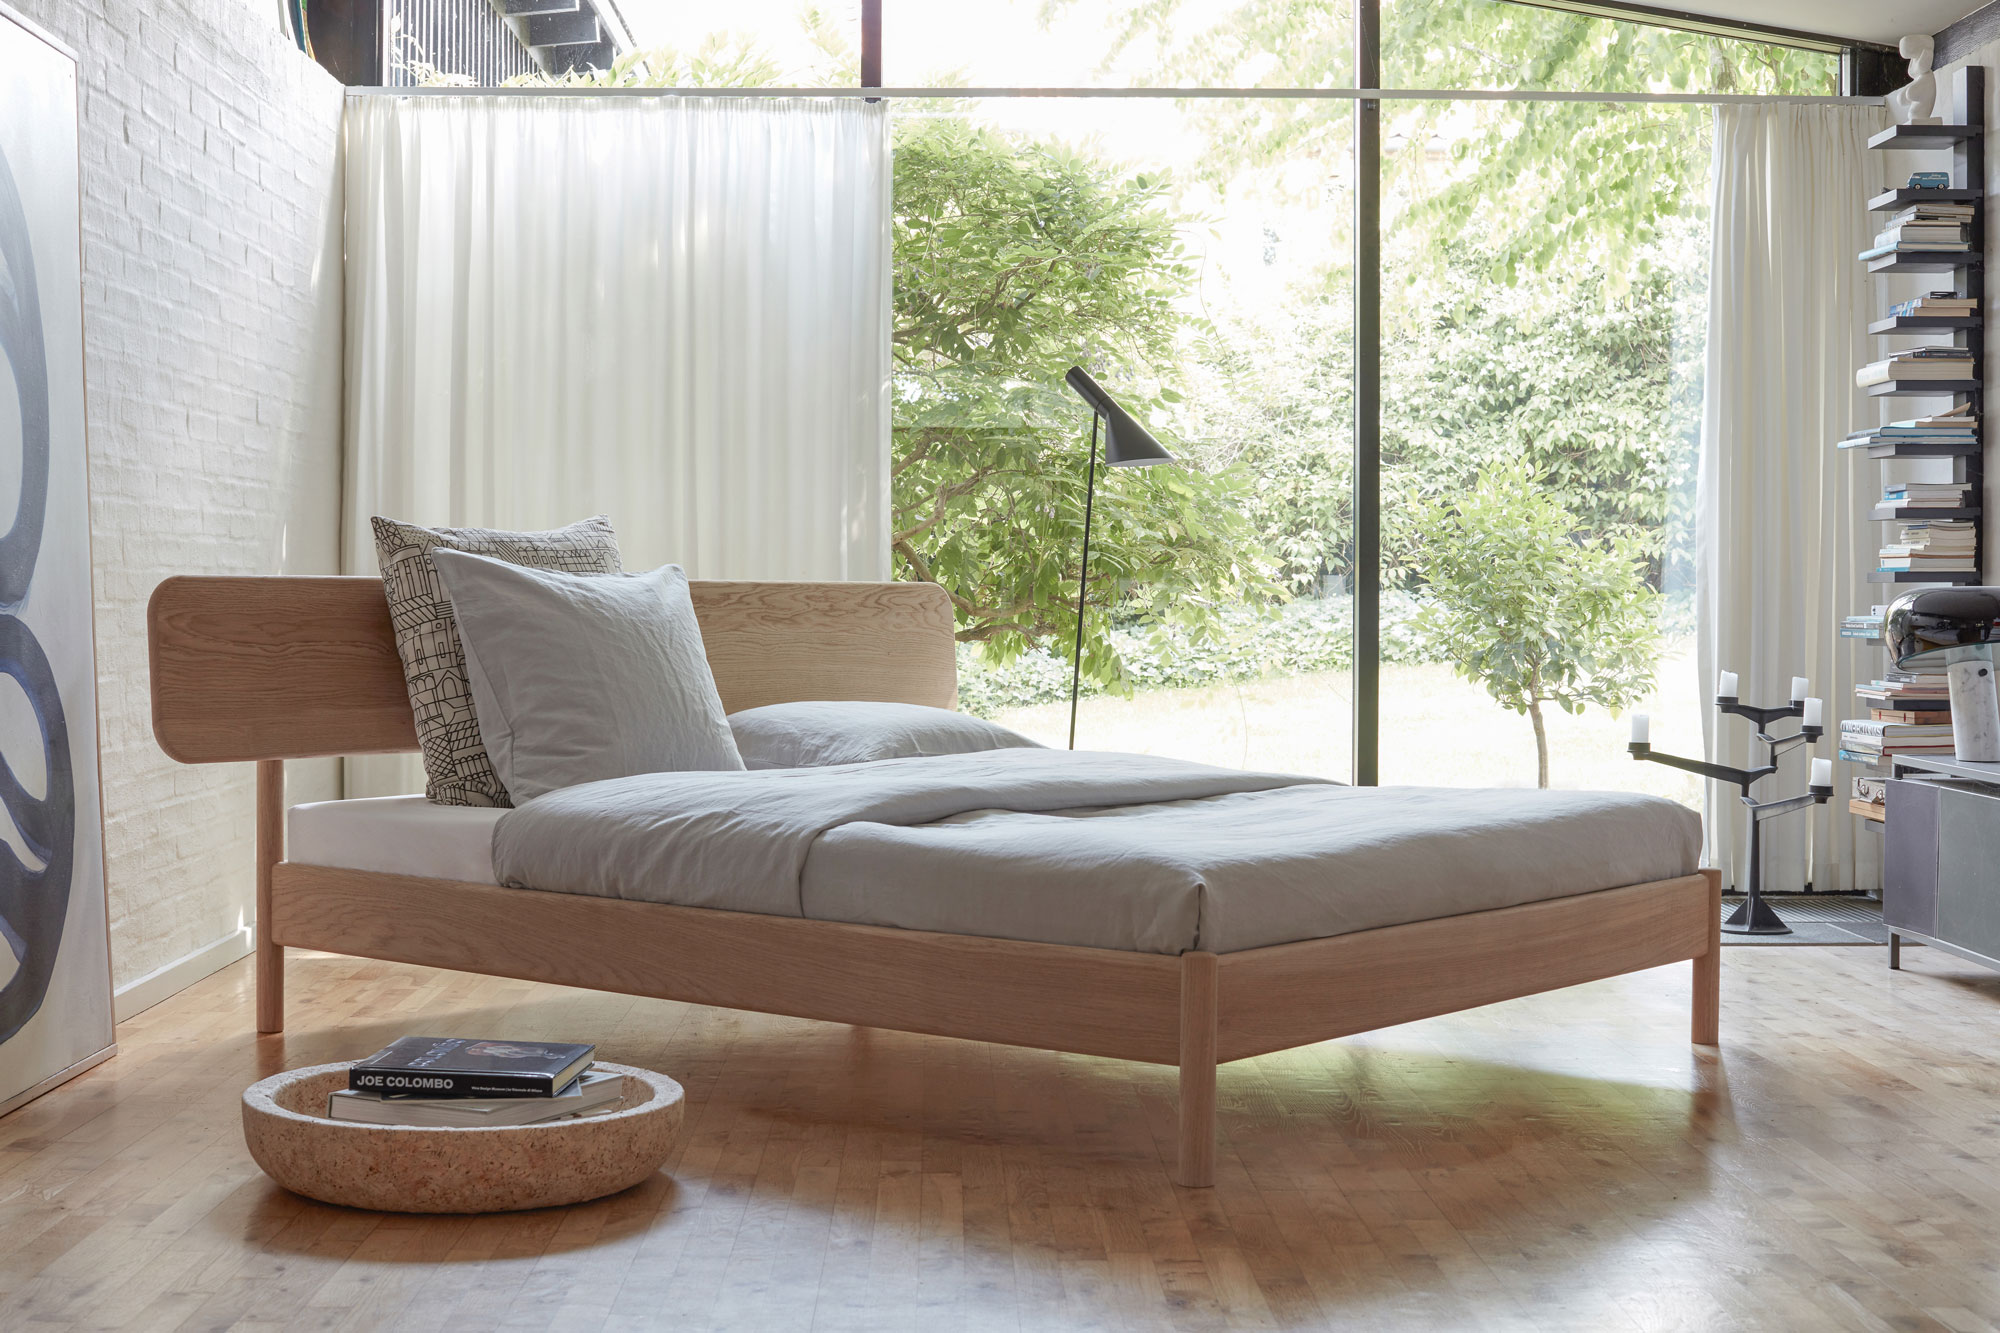 01---ALKEN-BED---RE-BEDS---DESIGN-BY-OLIVER-&-LUKAS-WEISSKROGH.jpg